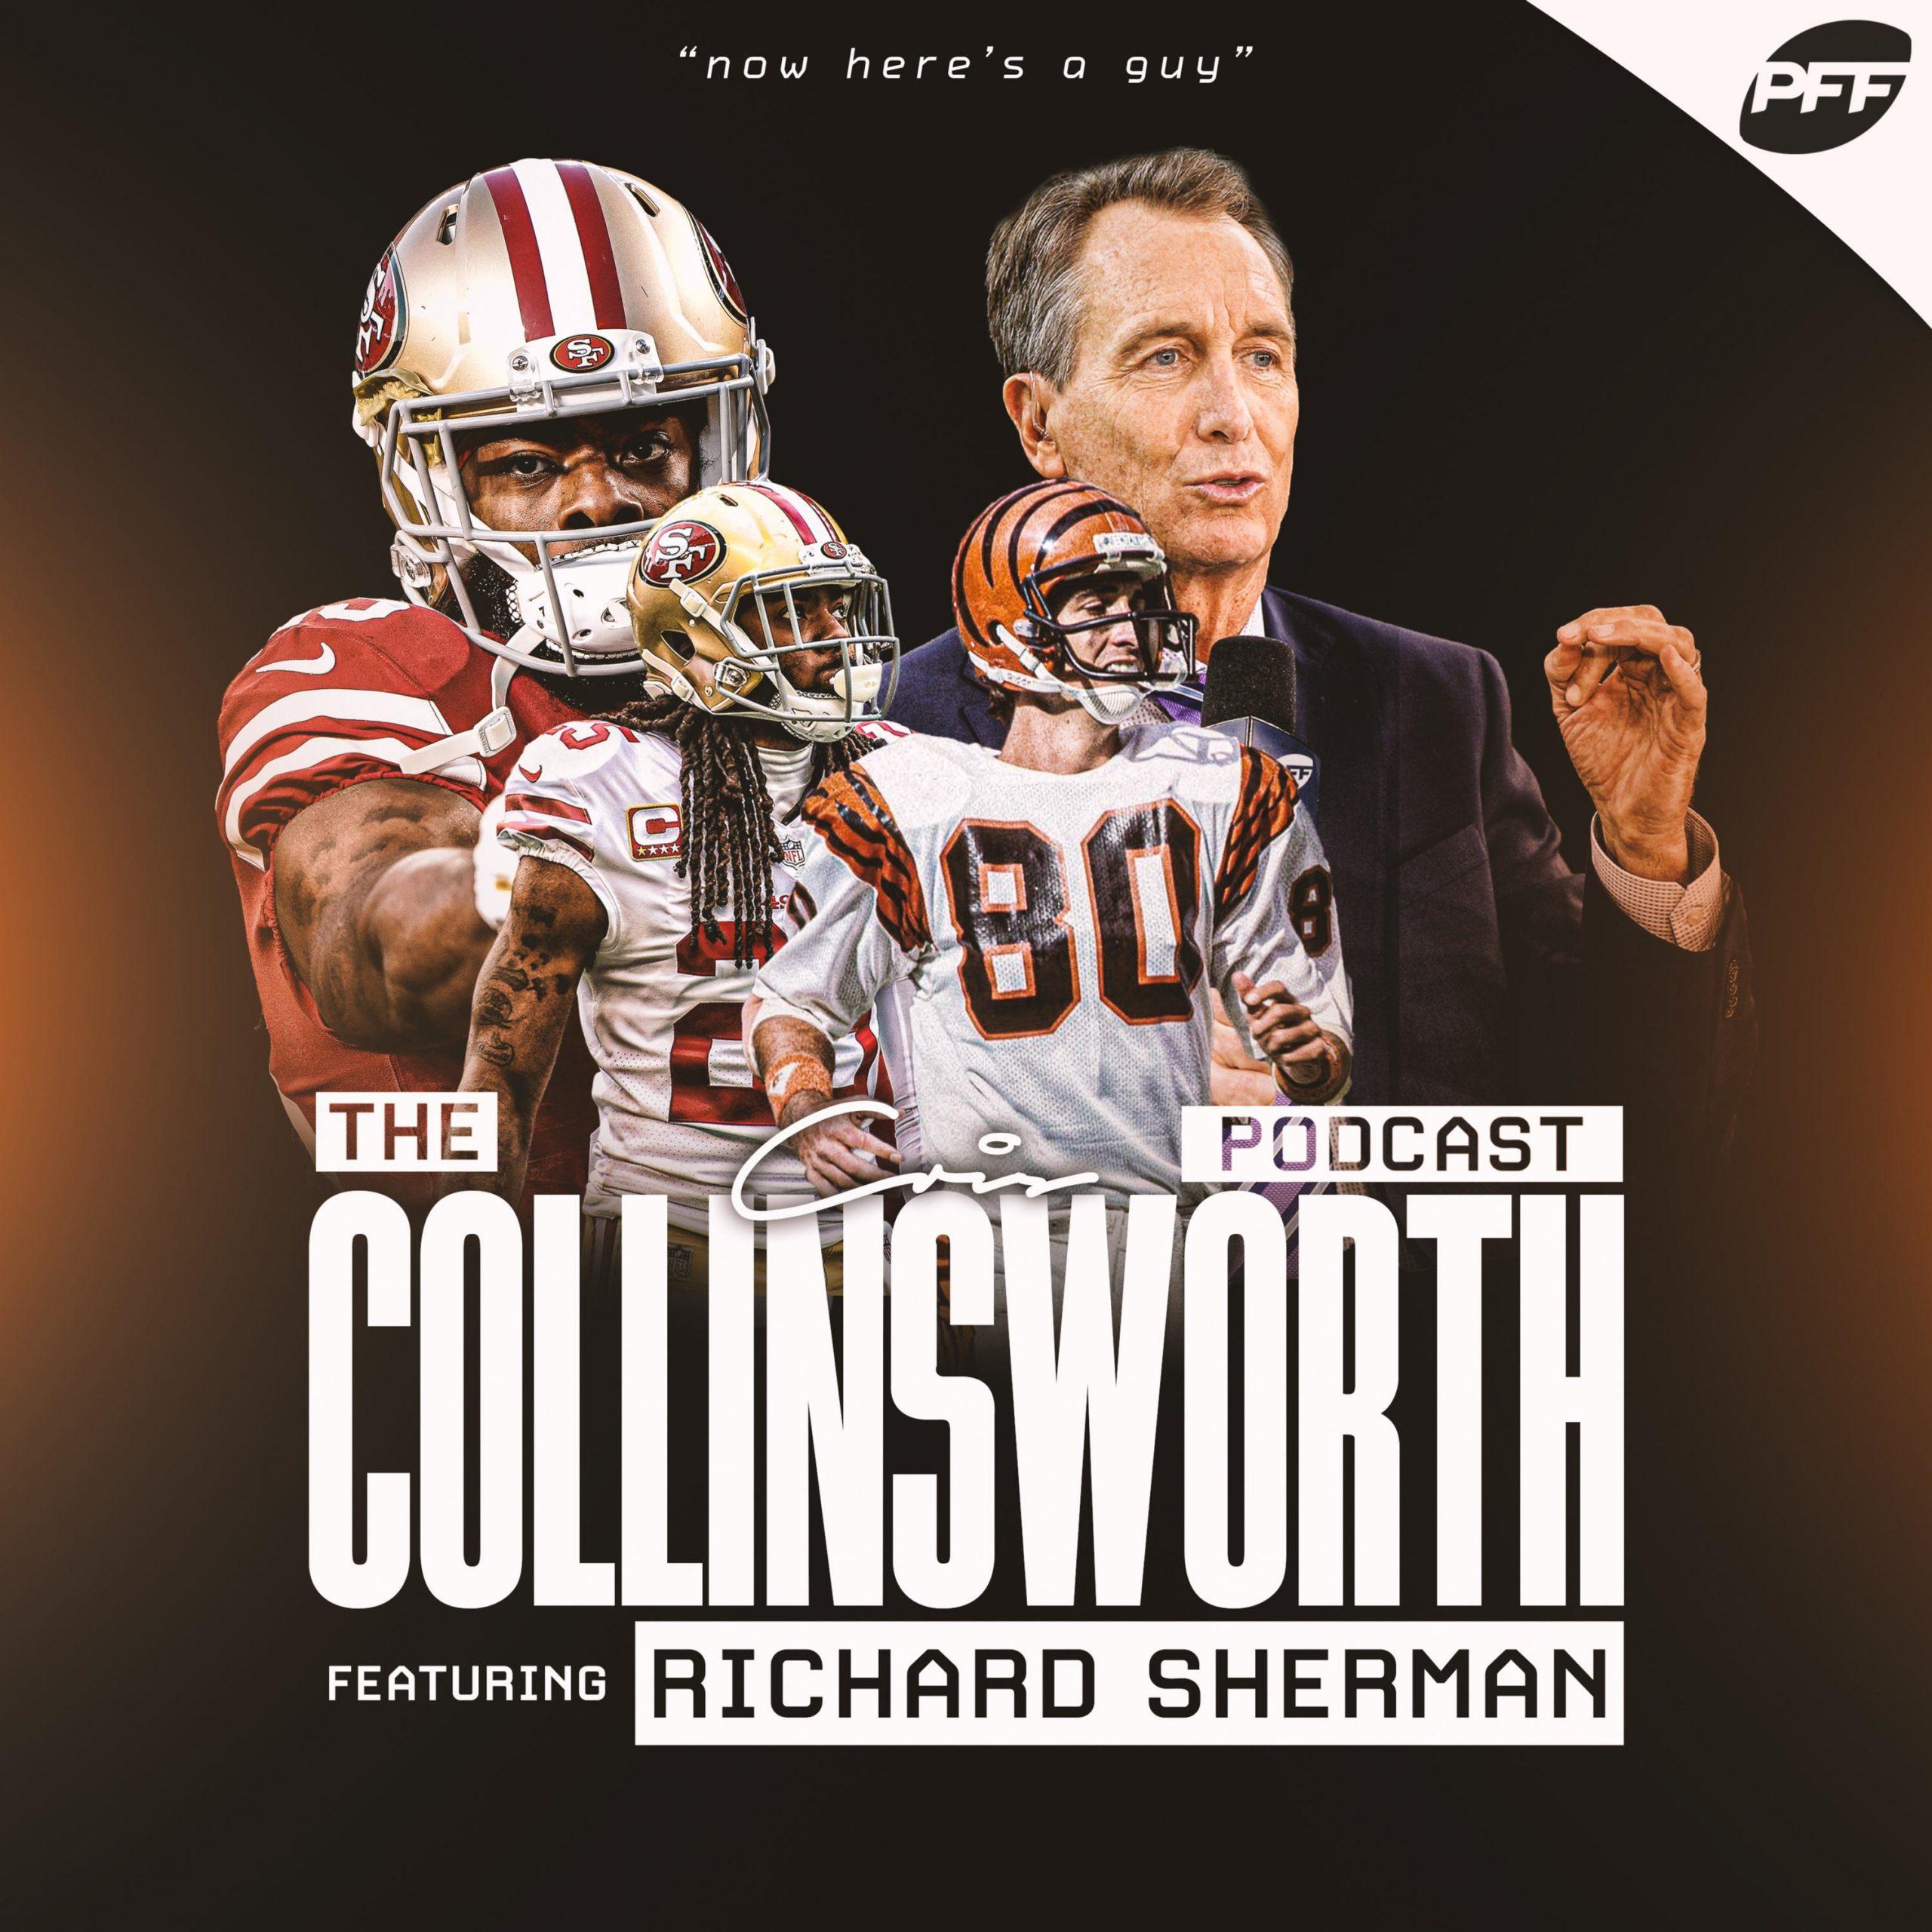 The Cris Collinsworth Podcast